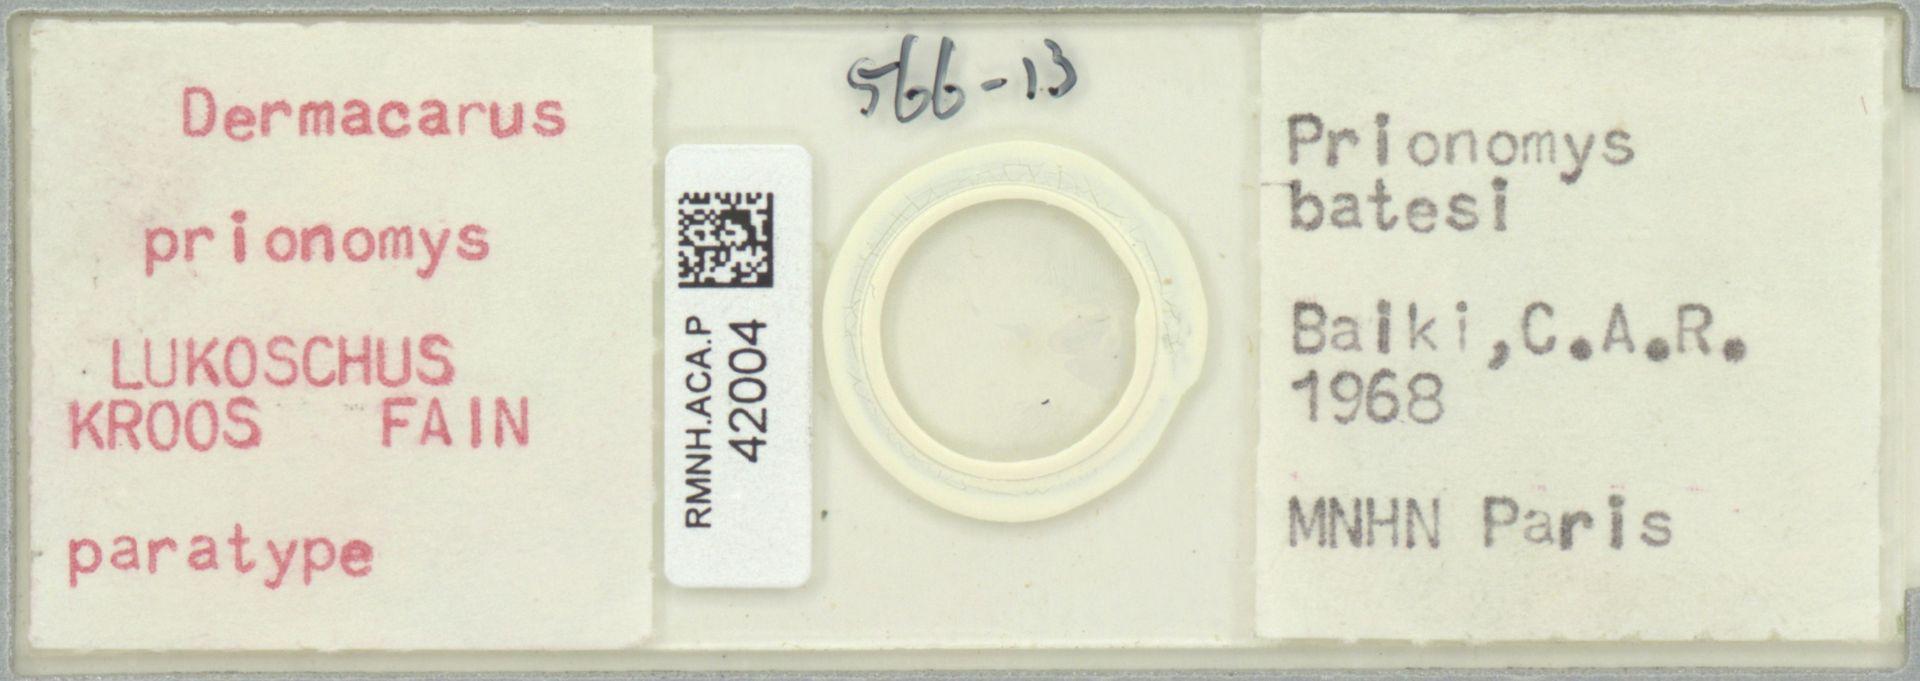 RMNH.ACA.P.42004 | Dermacarus prionomys LUKOSCHUS KROOS FAIN